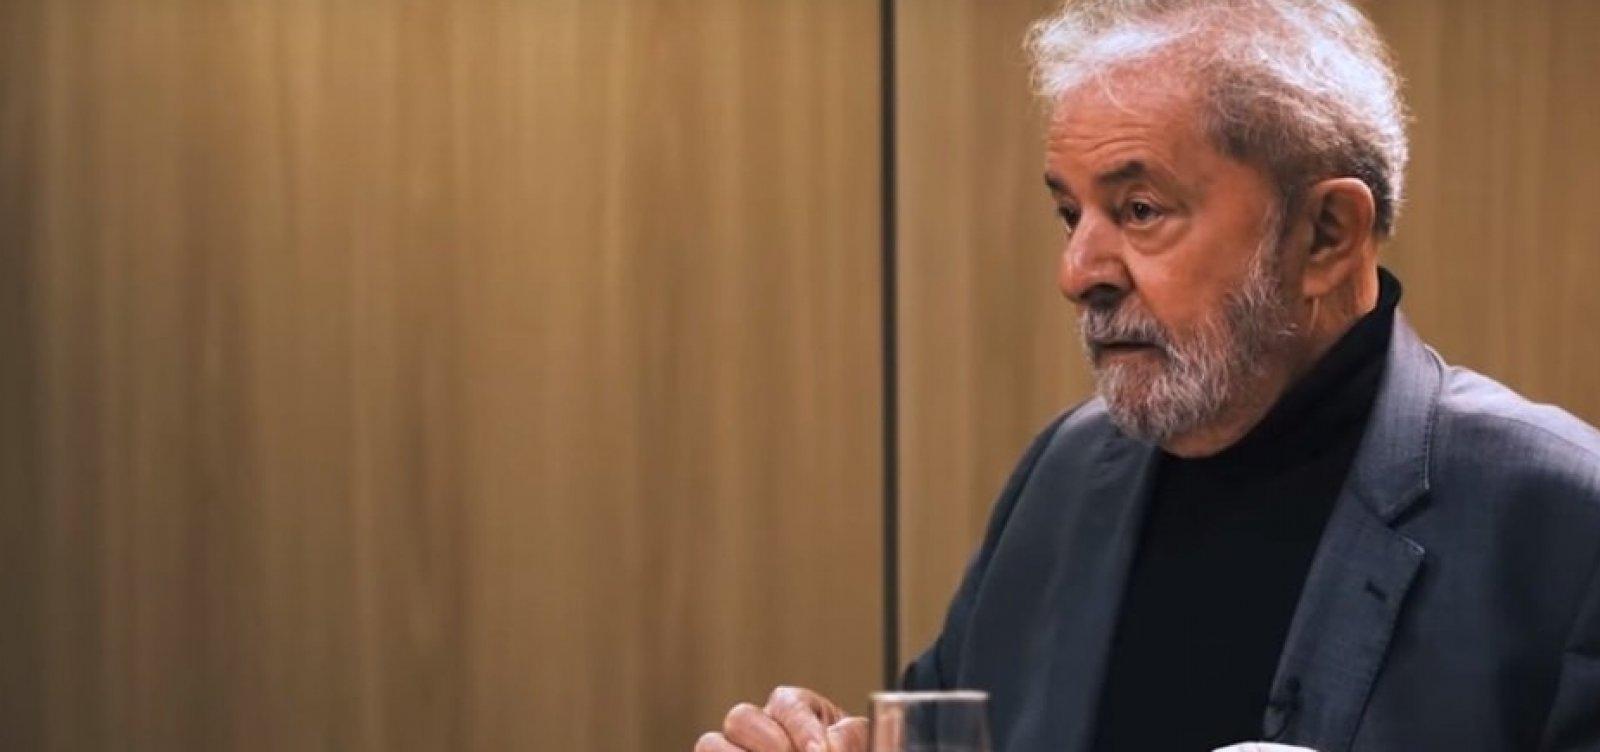 Lula: 'Bolsonaro é a velha política, eu sou a nova'